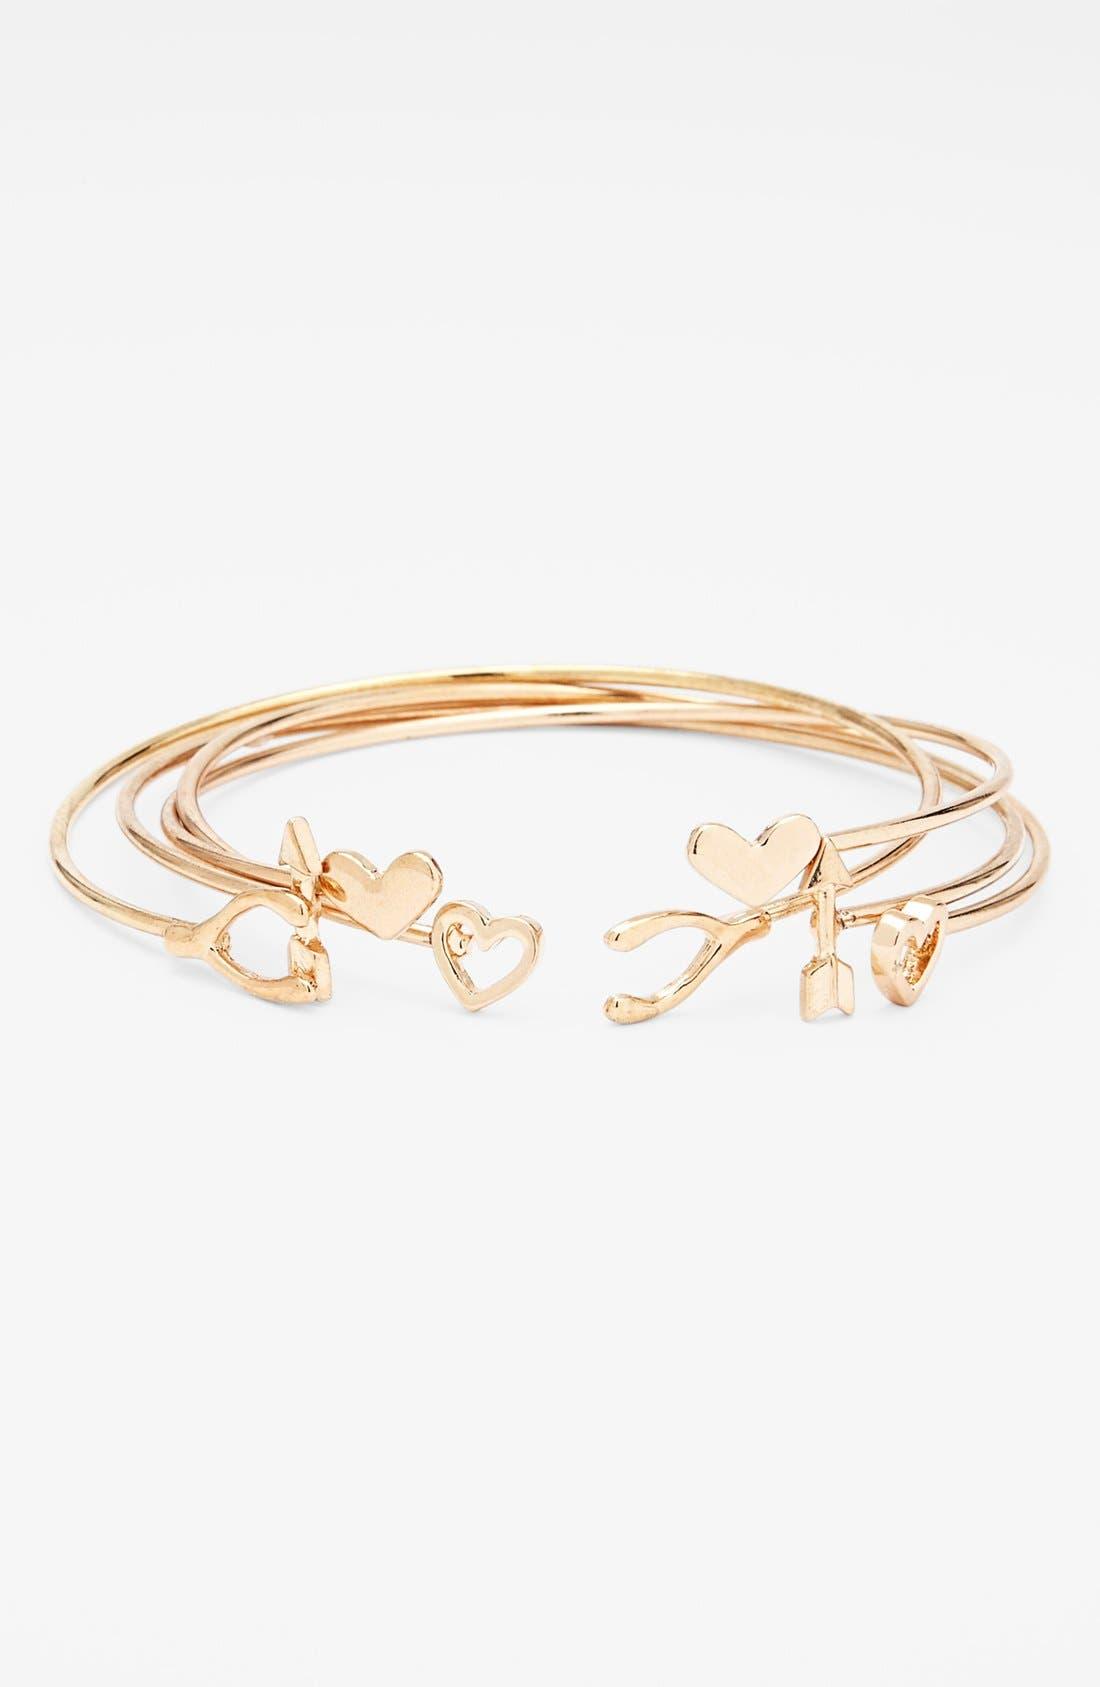 Main Image - Kool Konnections 'Dainty' Bracelets (Set of 4)